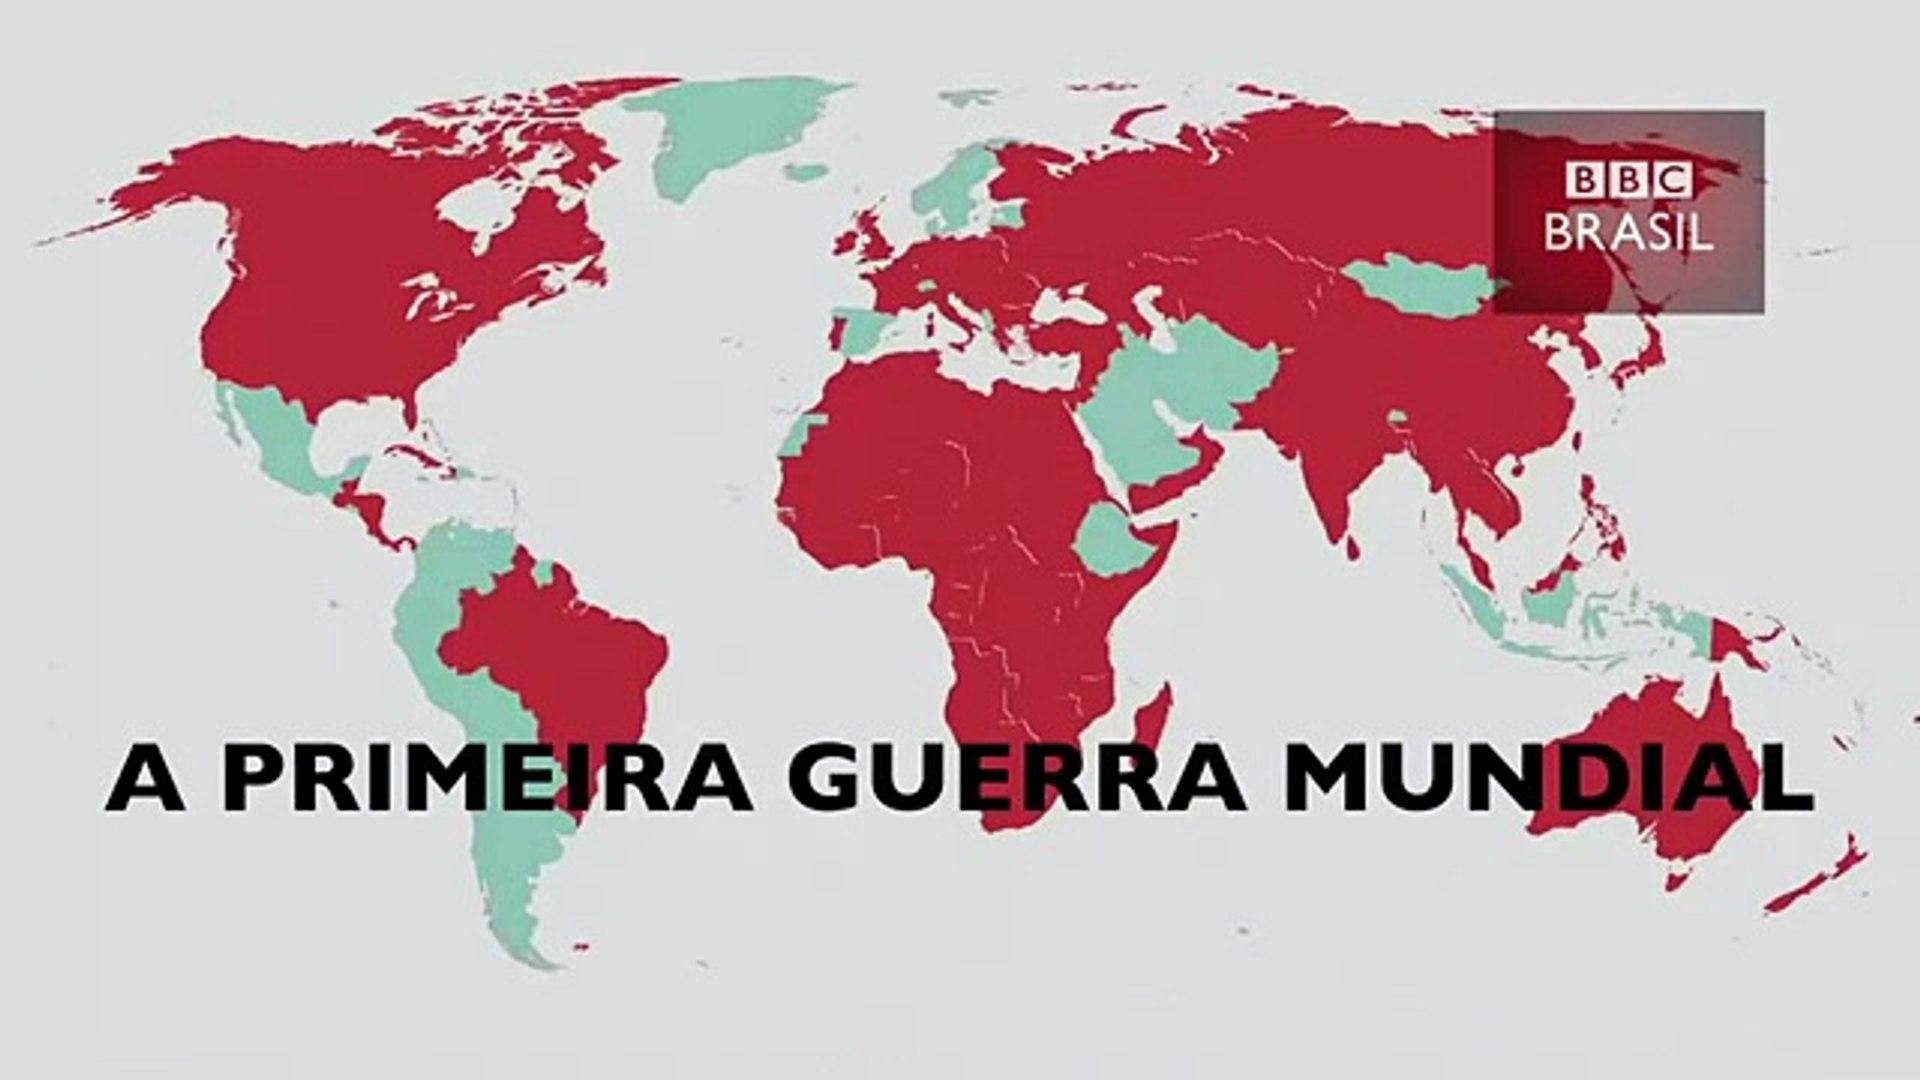 Prestes a acabar, conflito colombiano é o mais duradouro do continente